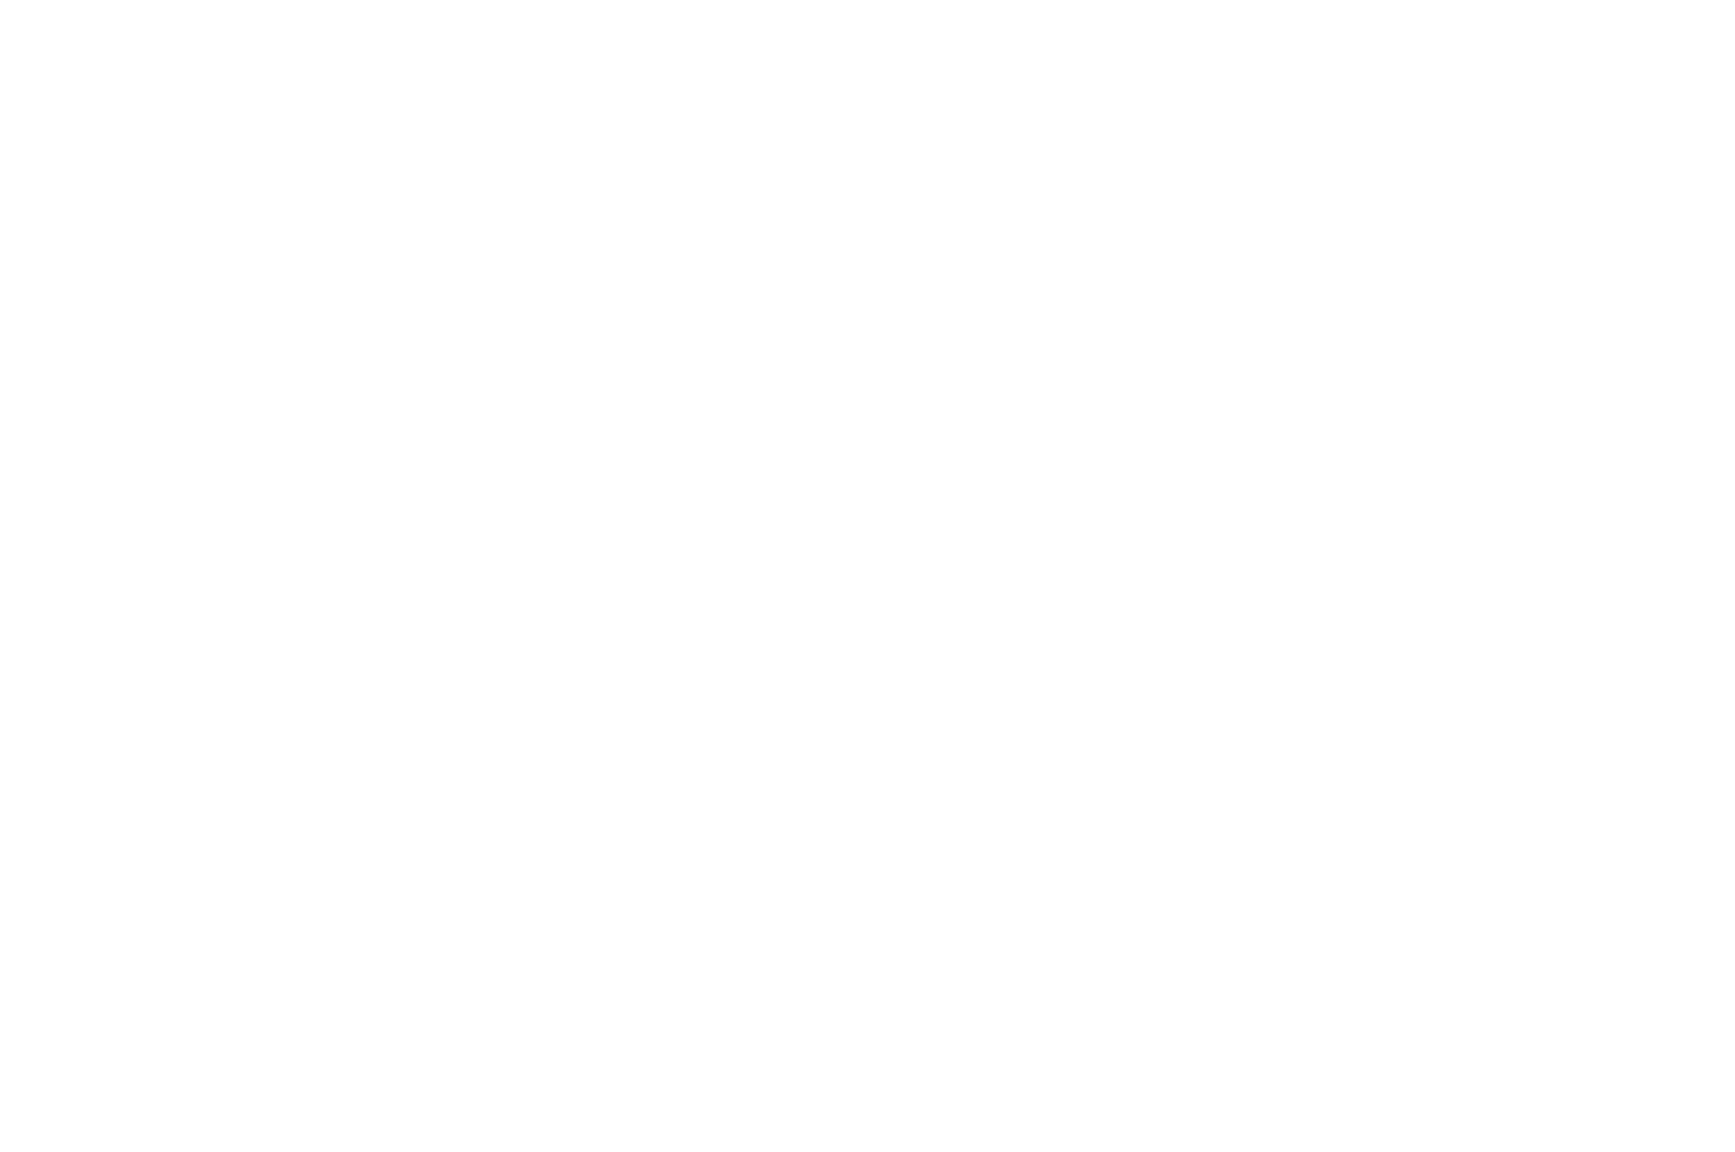 BEST DIALOGUE NOMINEE - Queen Palm International Film Festival - 2021